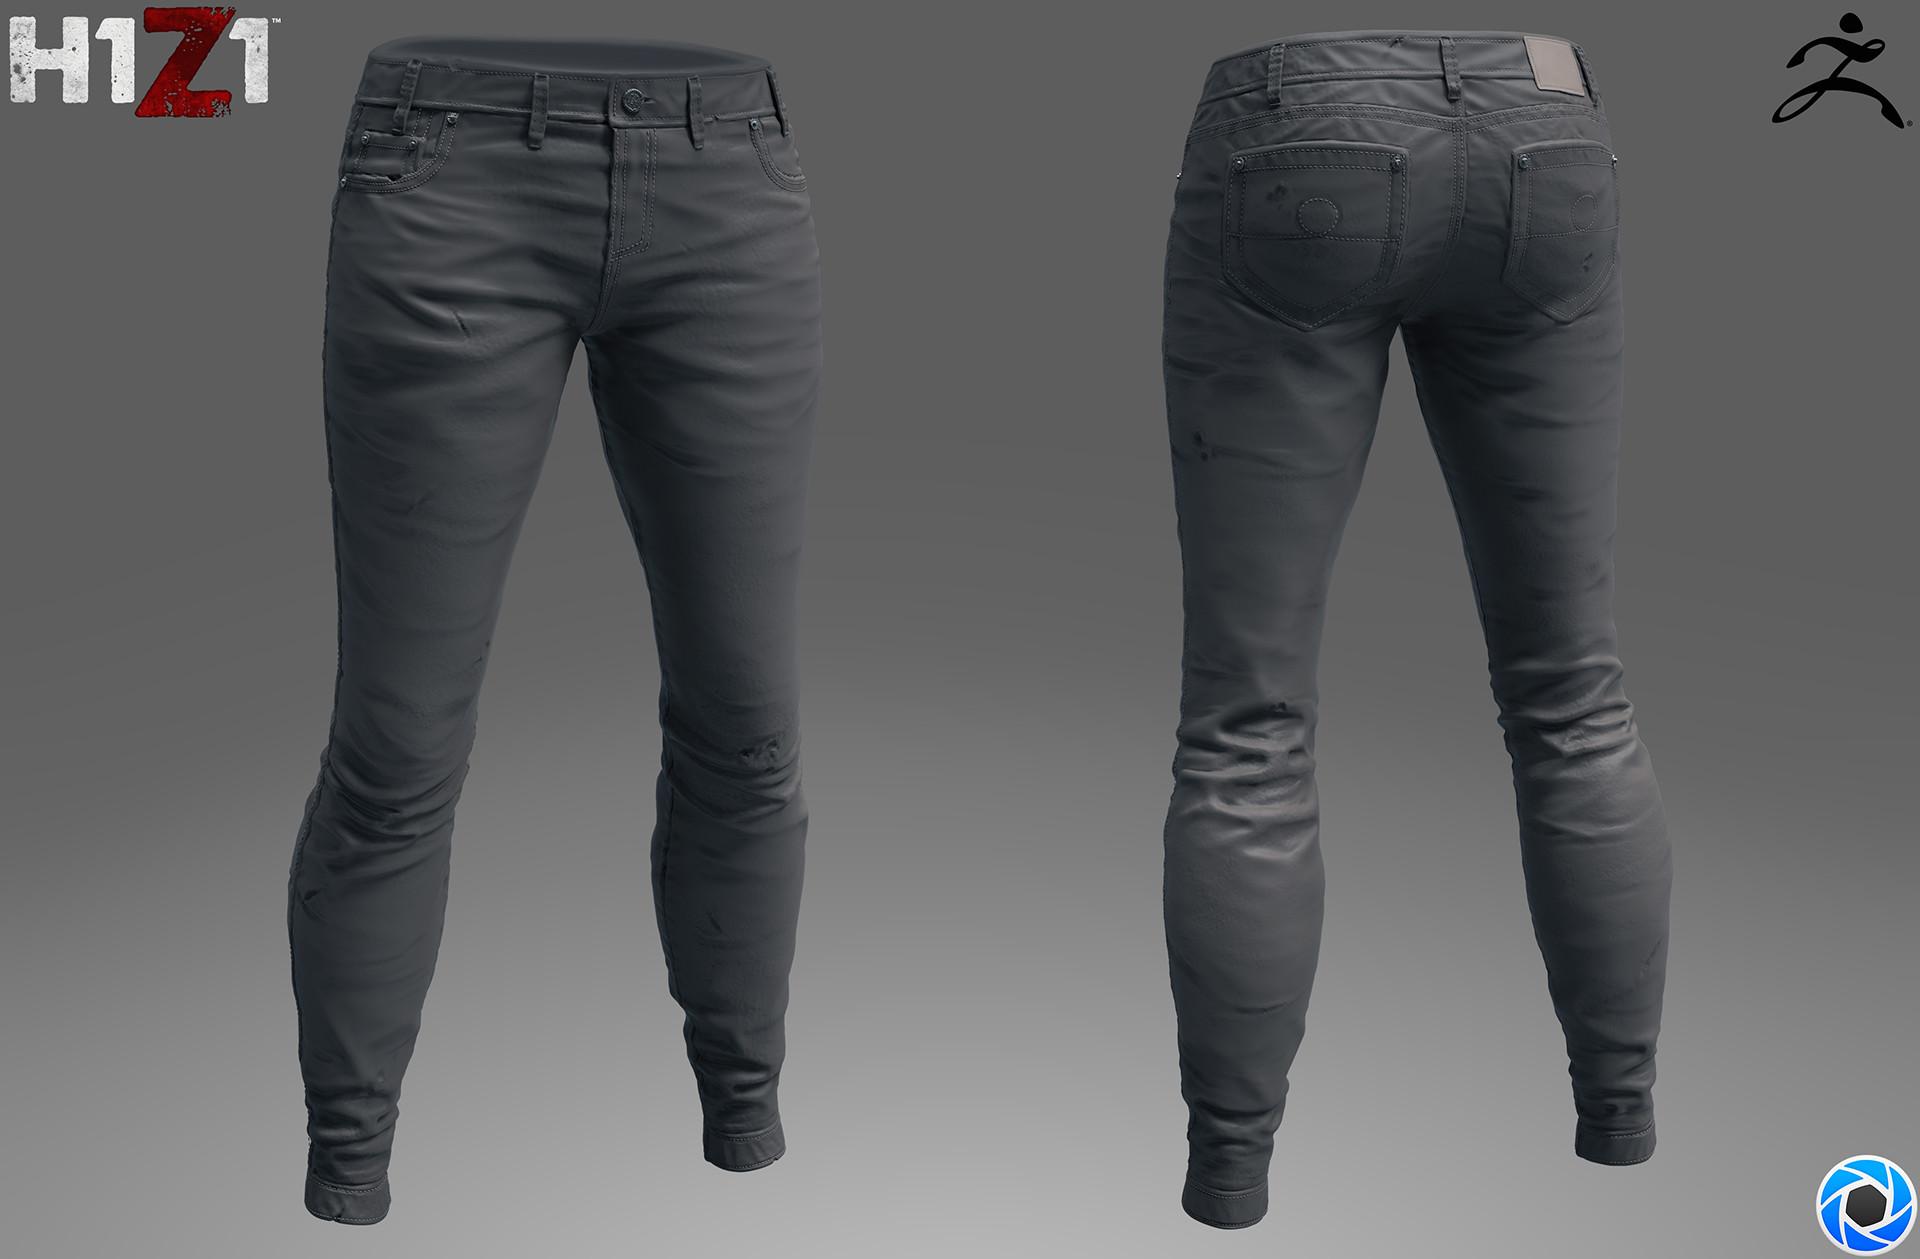 Satoshi arakawa female jeans sculpt